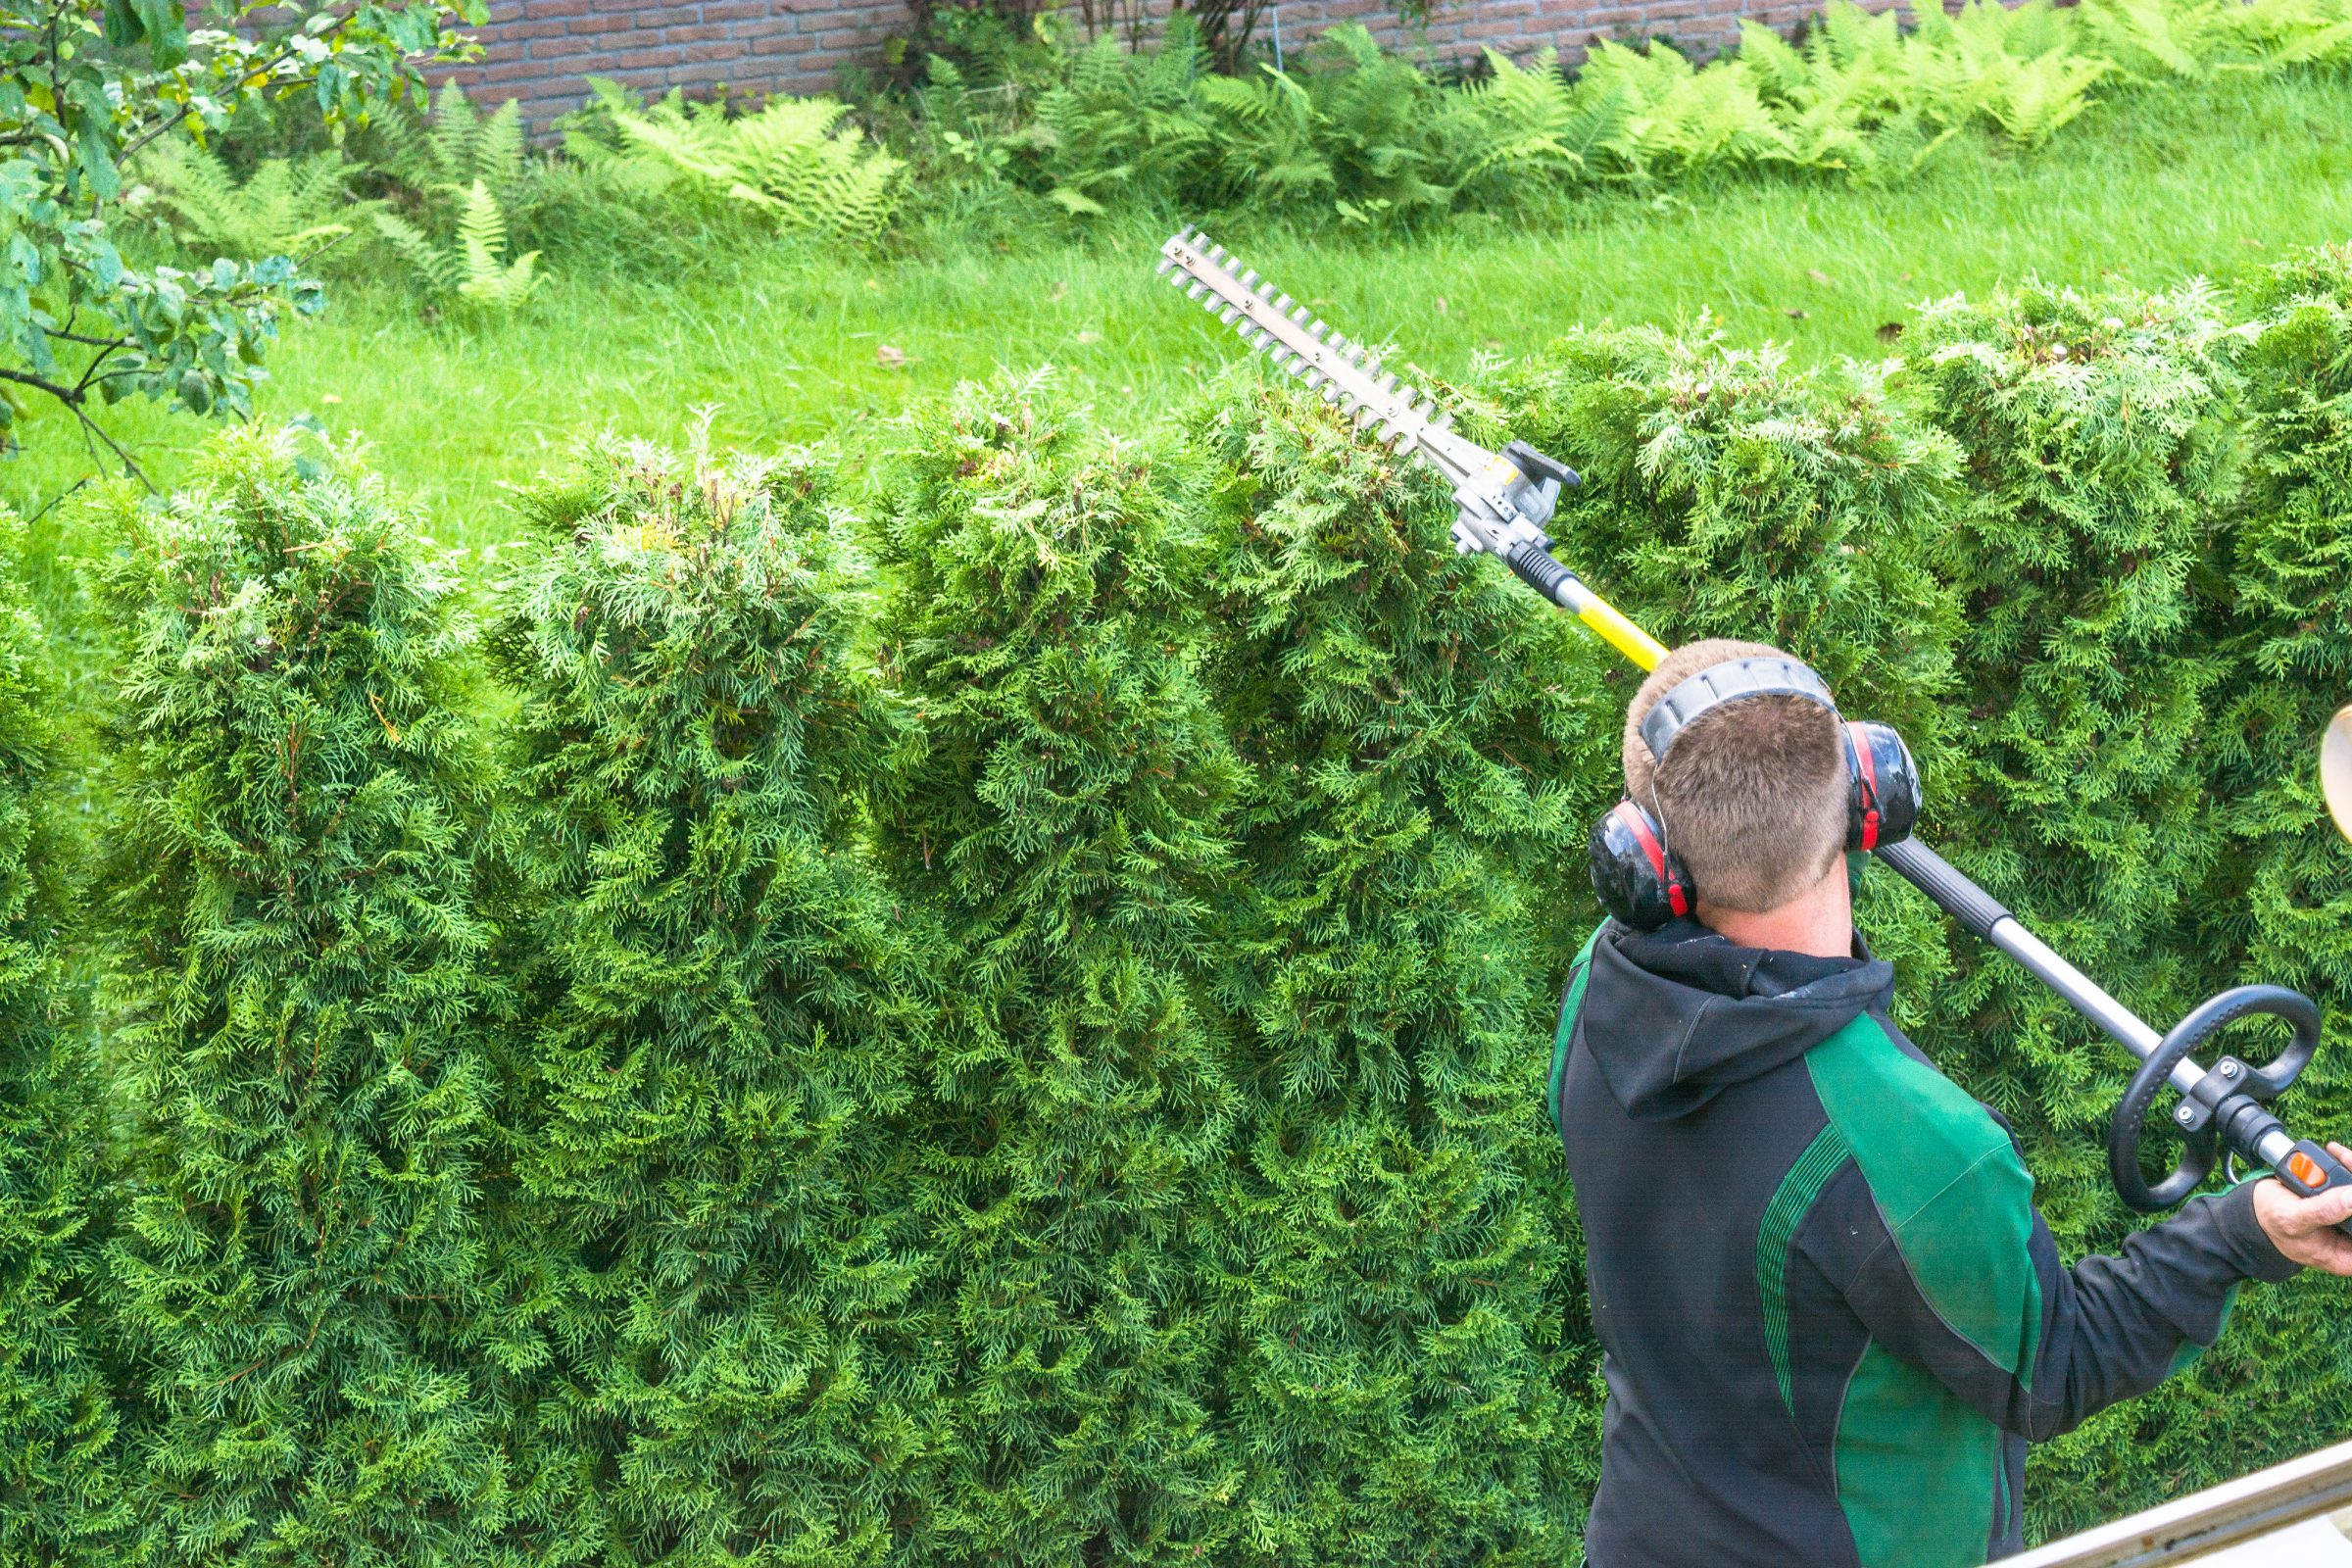 tuinonderhoud hovenier tuinman